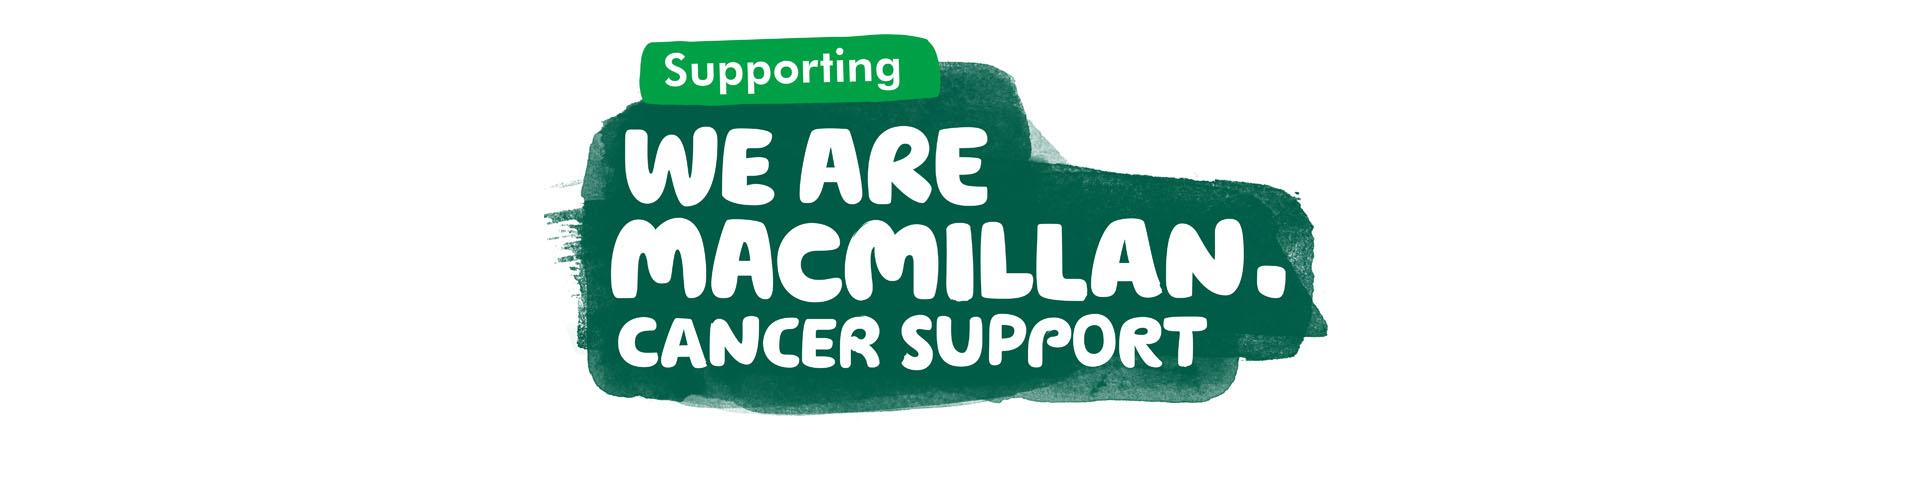 1,000,000kg Deadlift Challenge for Macmillan Cancer Support